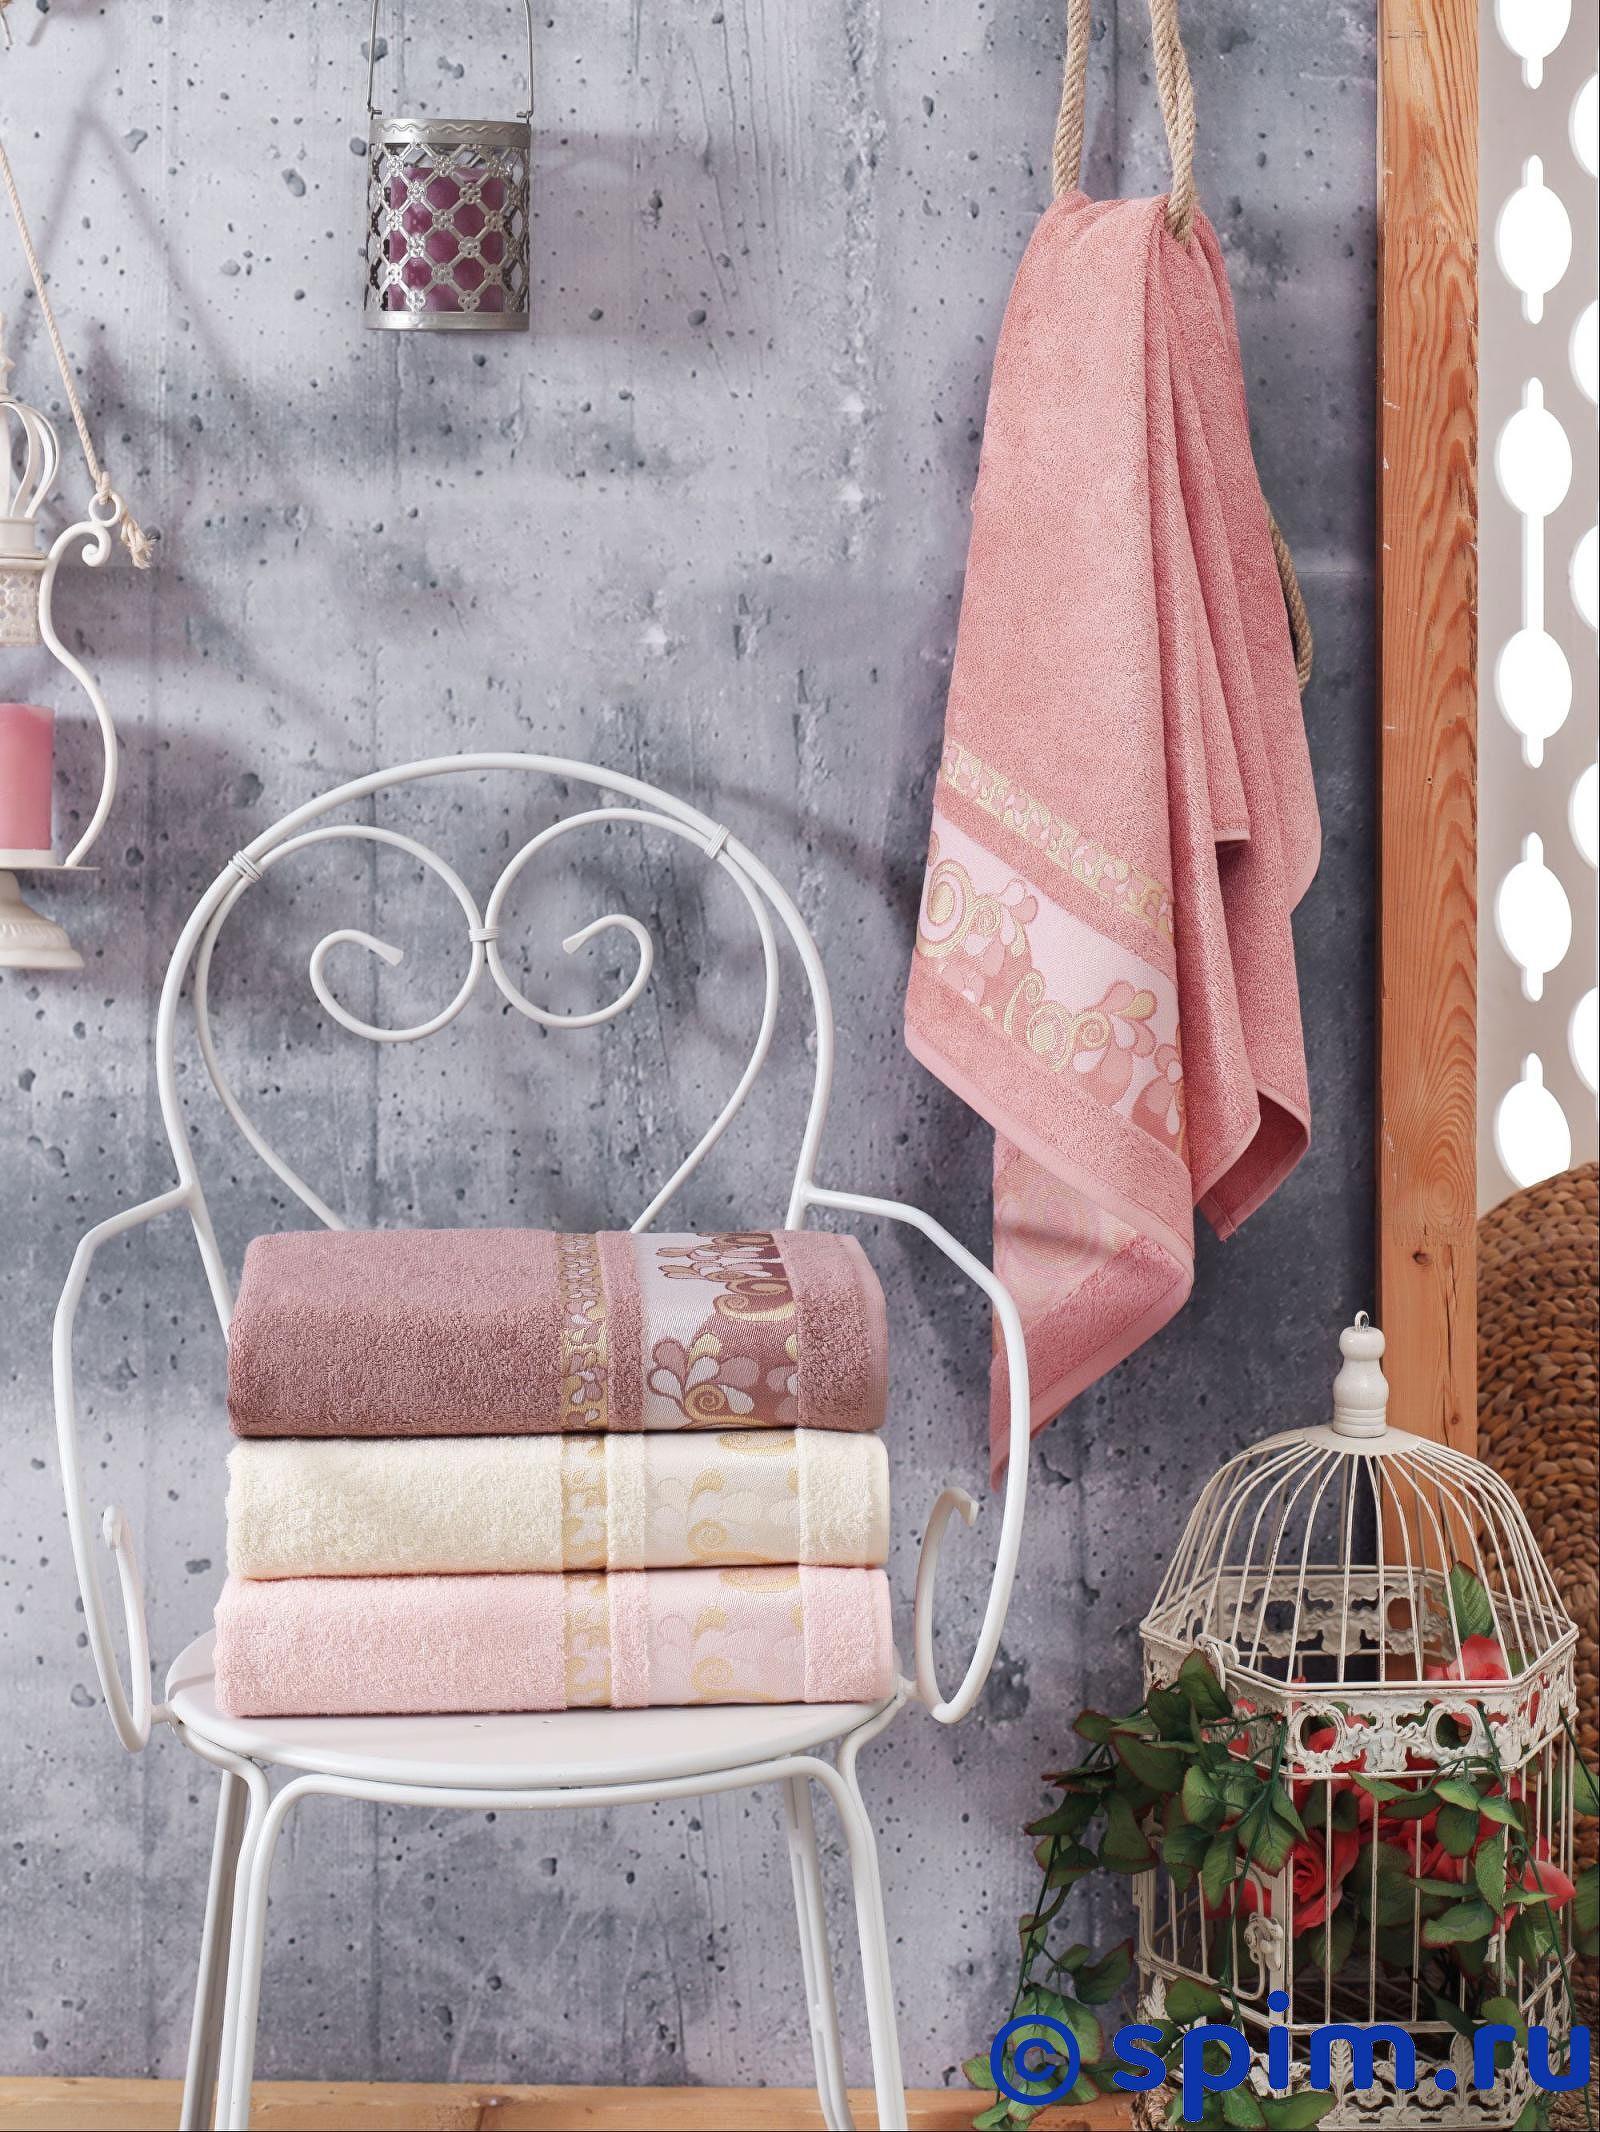 Набор из 4-х полотенец Do&co Hanna 70х140 см полотенца do n co полотенце lady цвет мятный набор